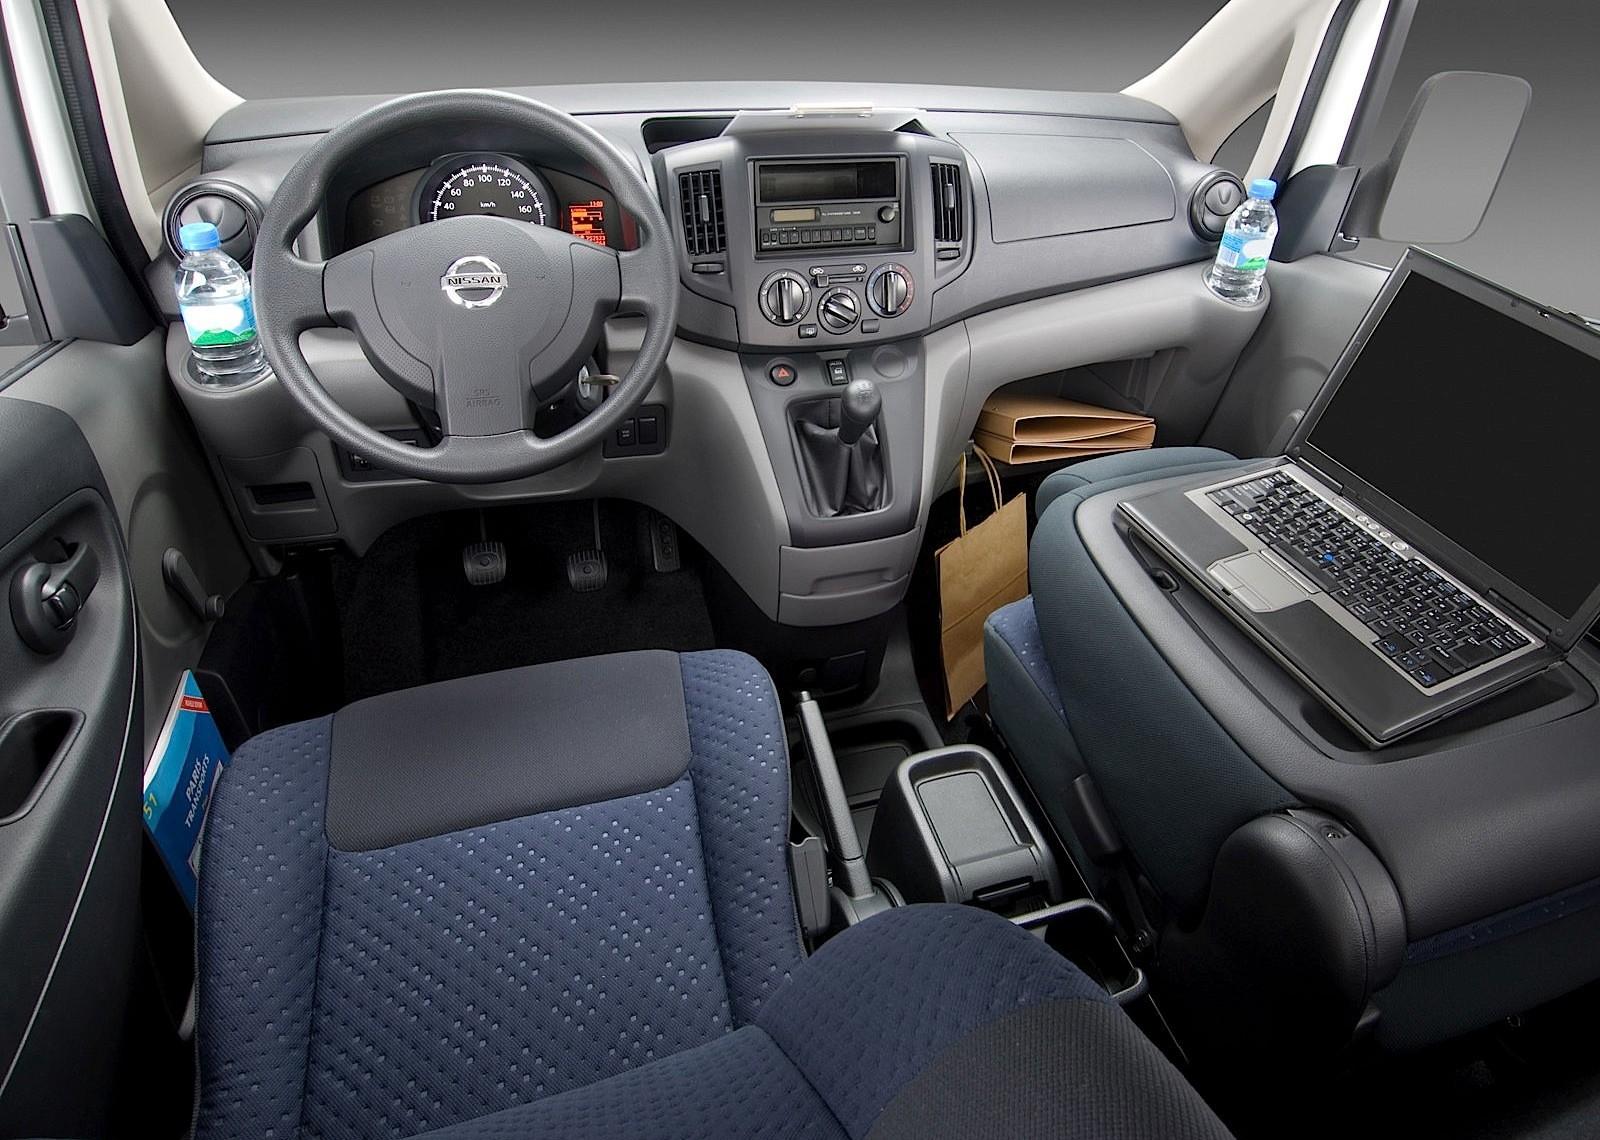 Nissan Nv200 2009 2010 2011 2012 2013 2014 2015